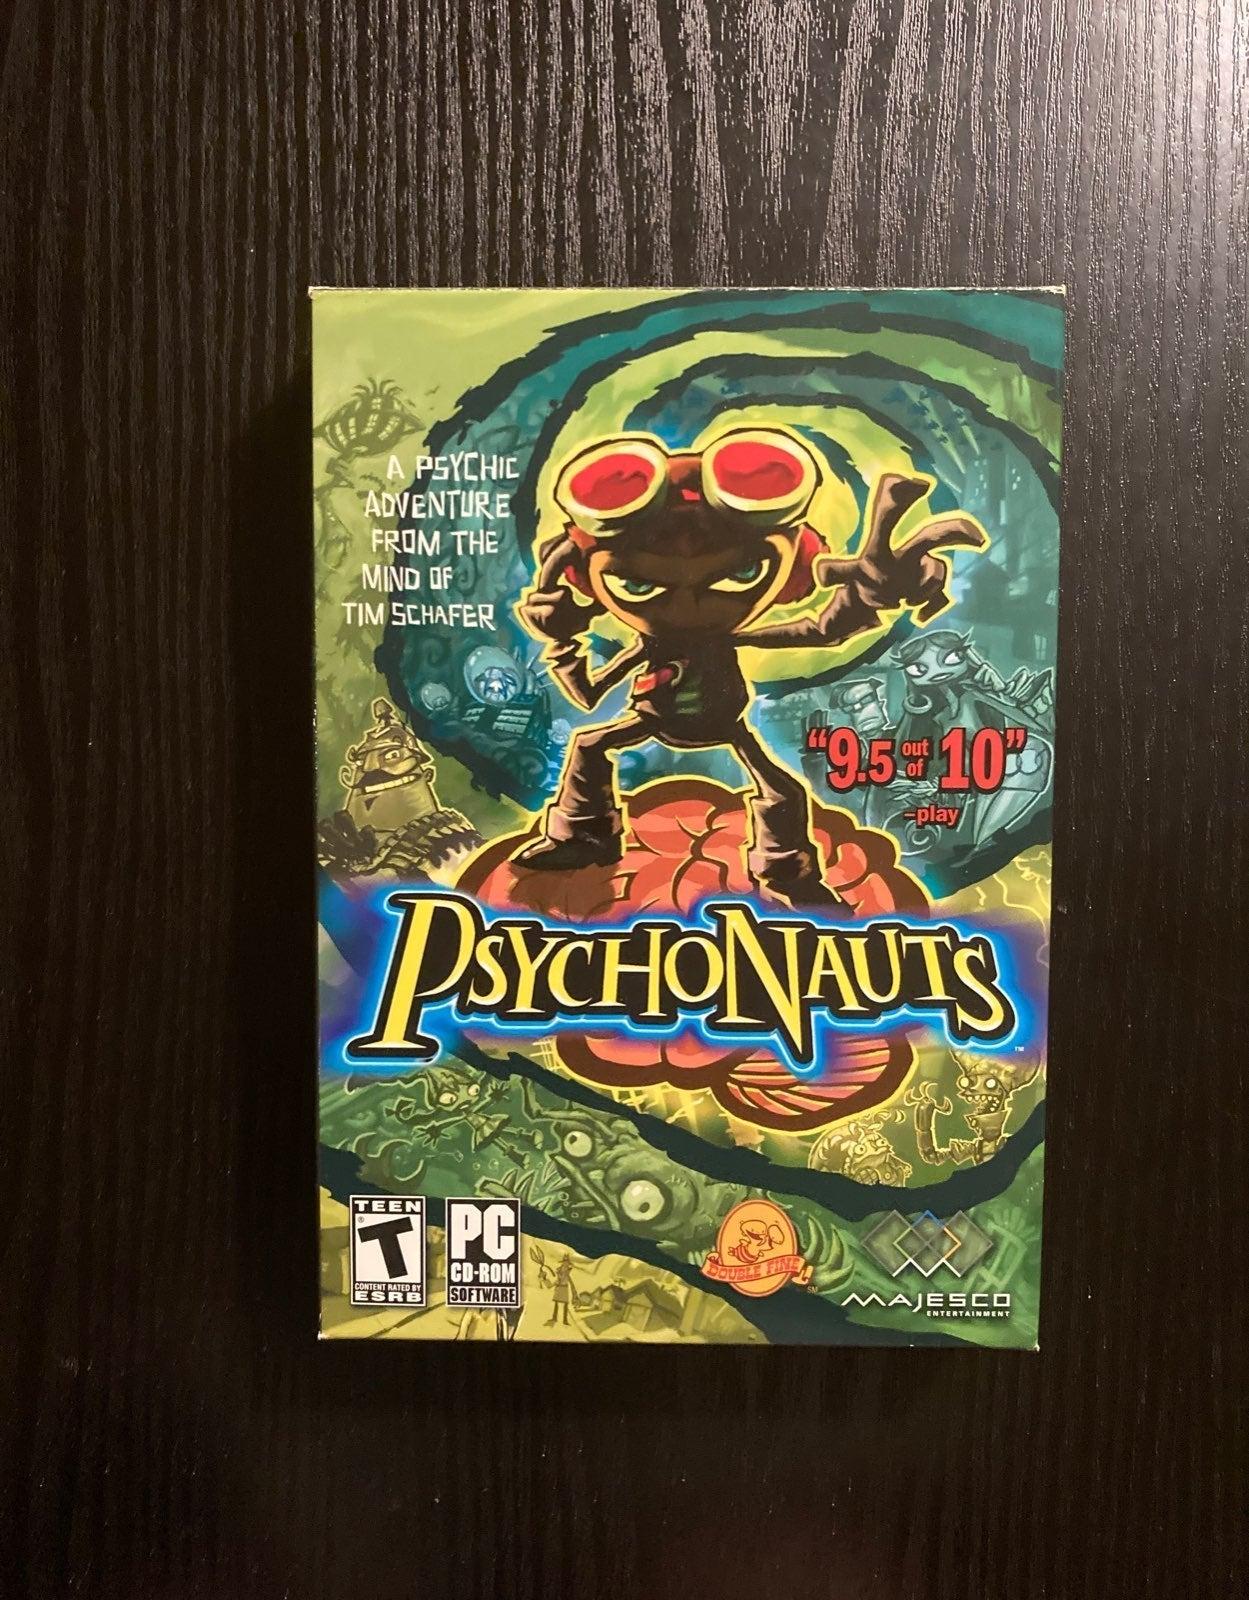 PC Game Psychonauts (2005) CIB VG